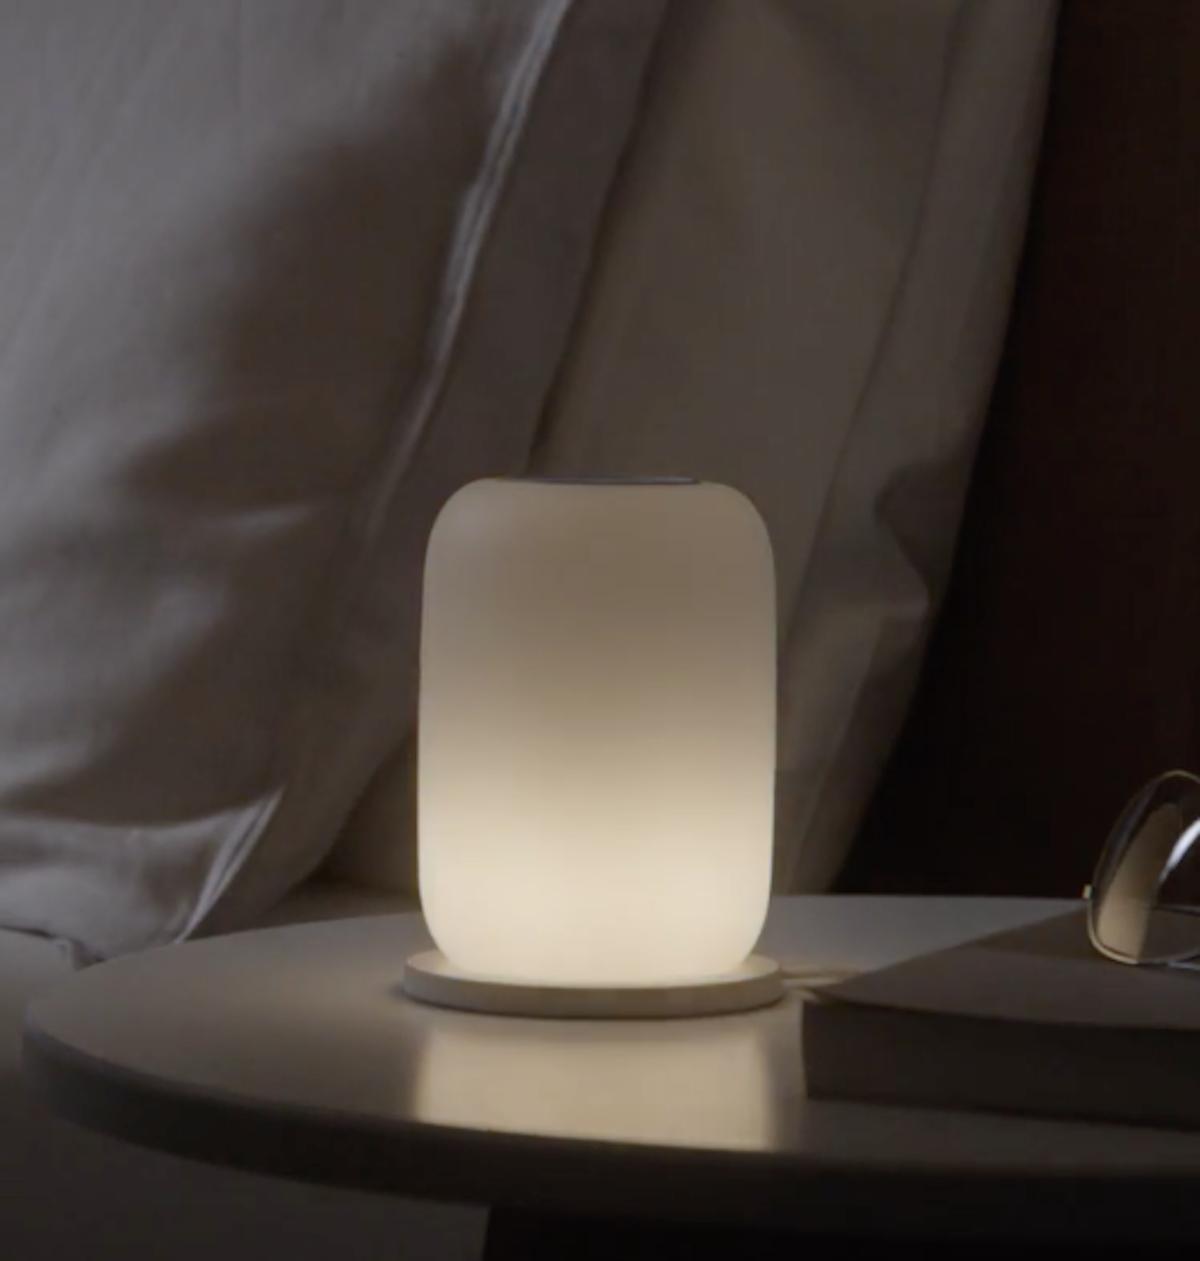 The Casper Glow - our magical light for better sleep